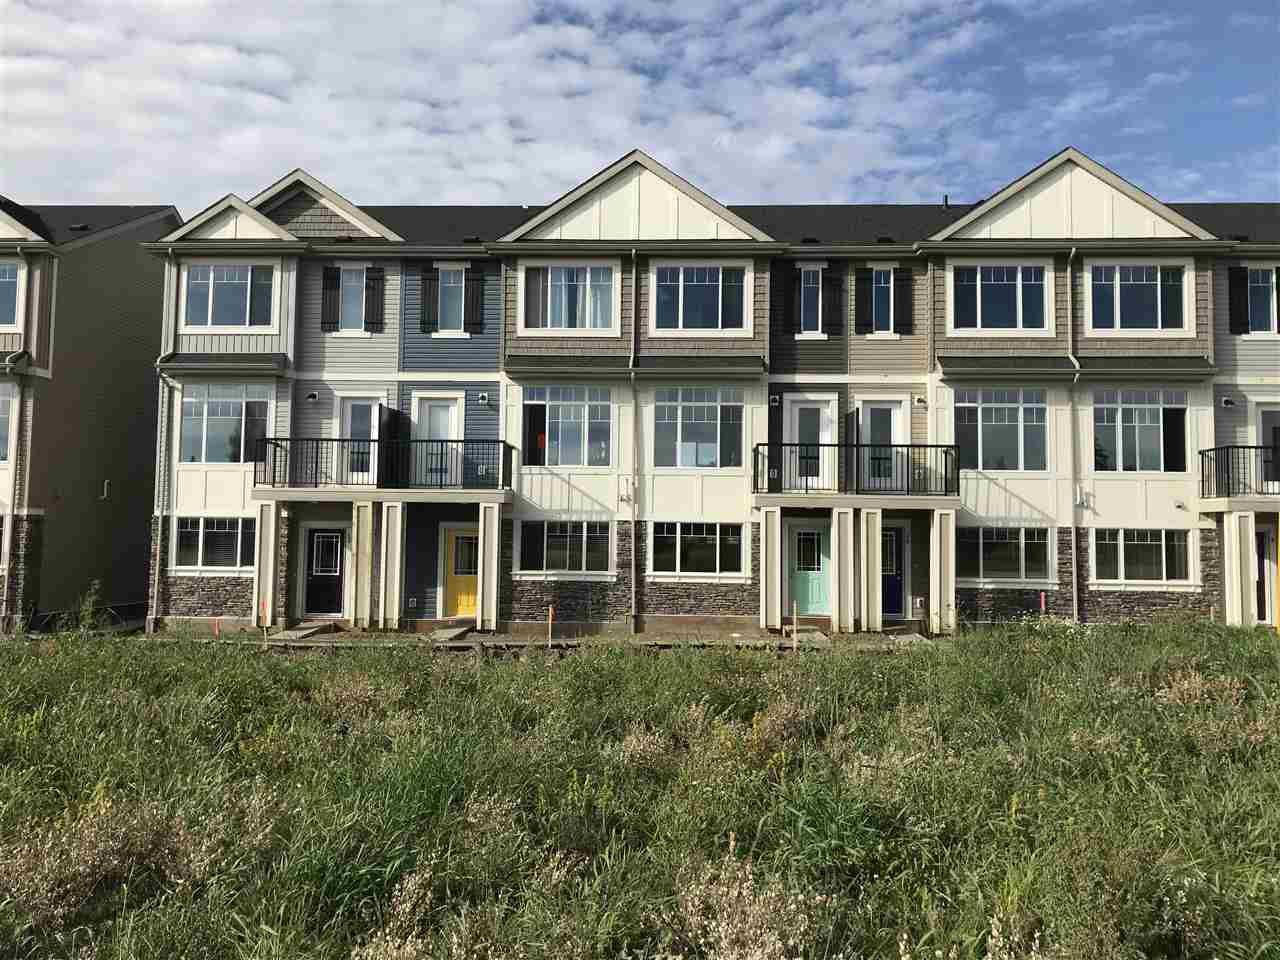 Main Photo: 11 11373 12 Avenue in Edmonton: Zone 16 Townhouse for sale : MLS®# E4173420